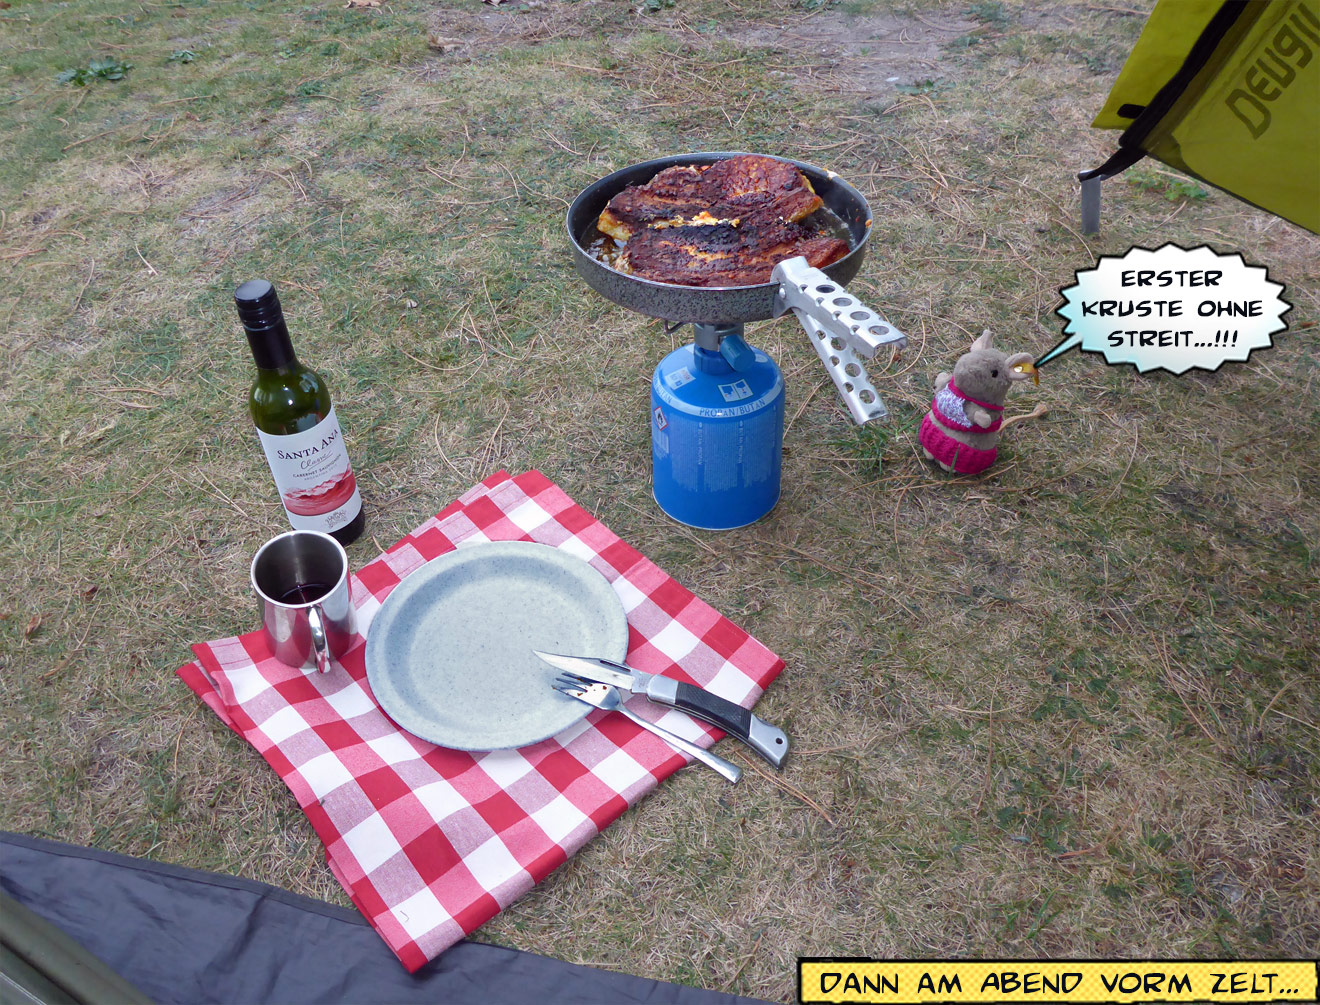 Campingküche braten vorm Zelt